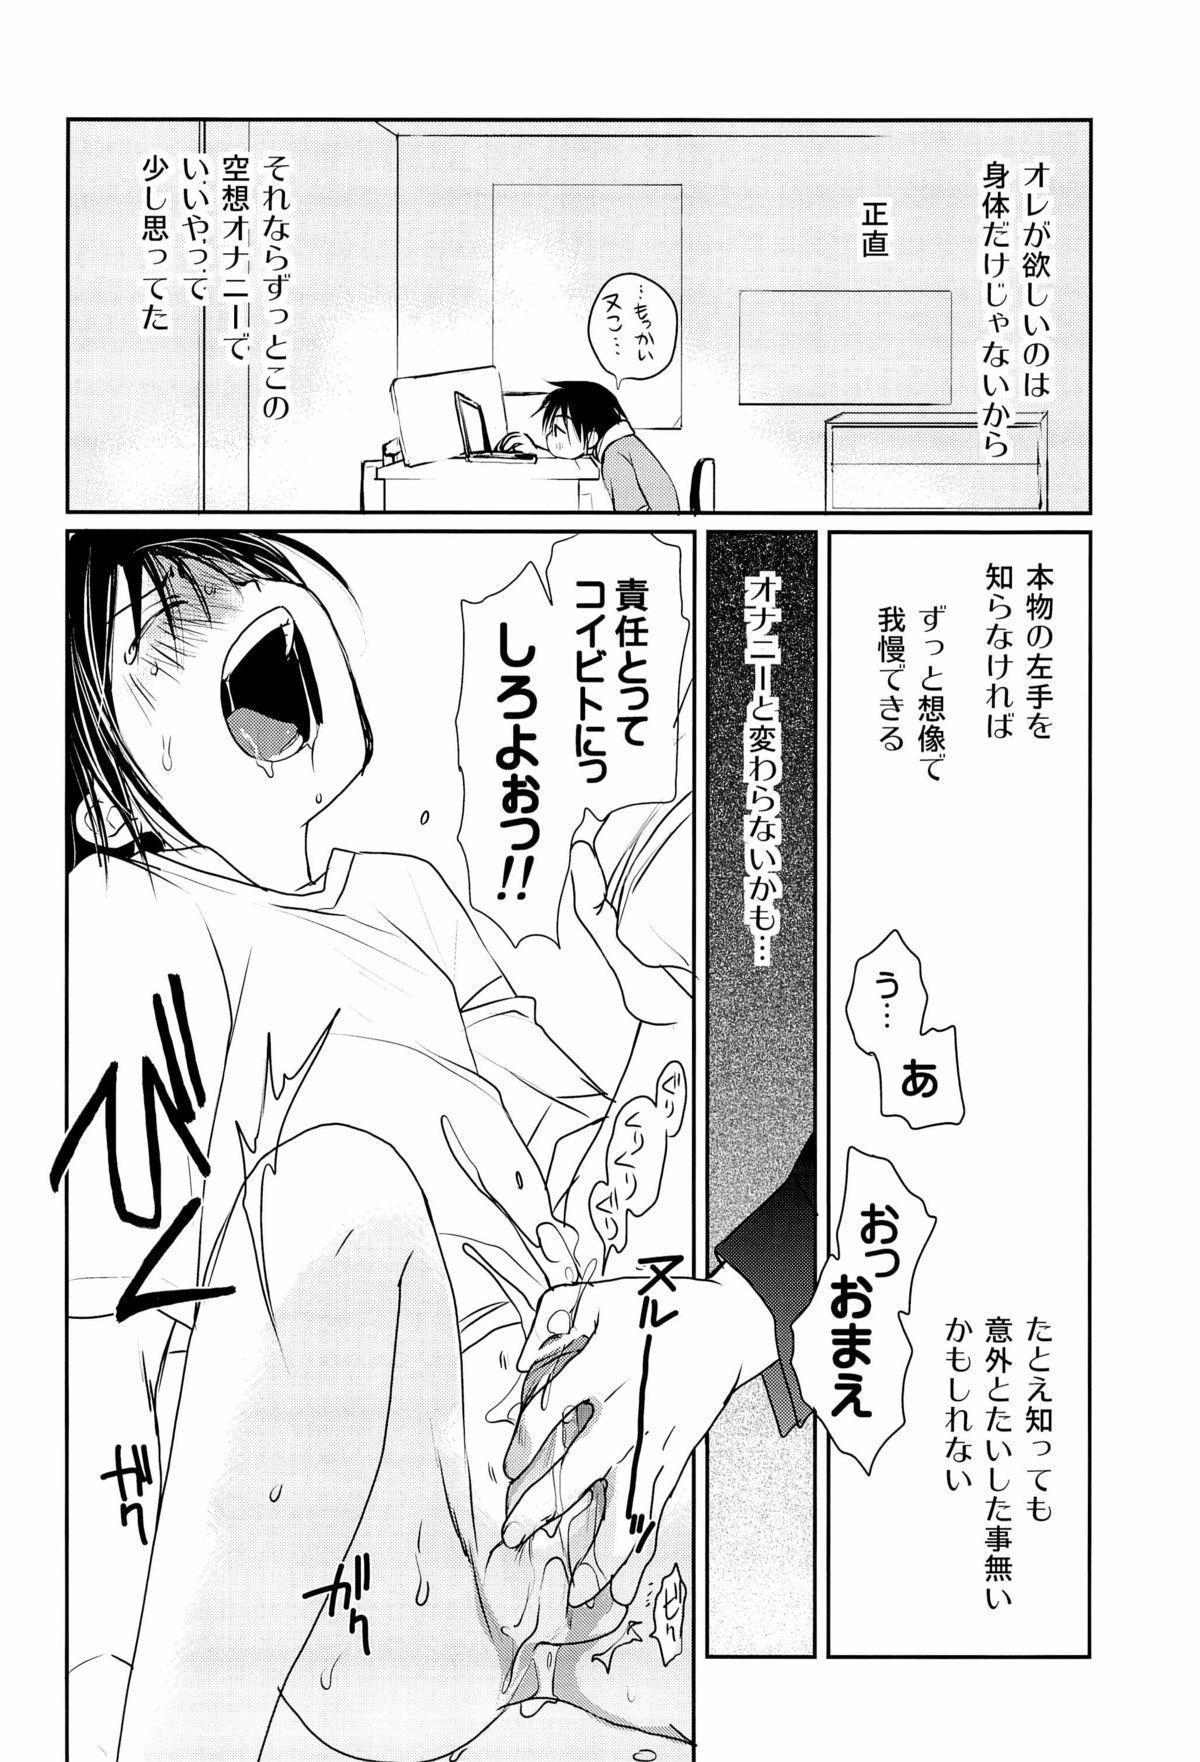 Megamix Gravitation Hiyoko 9